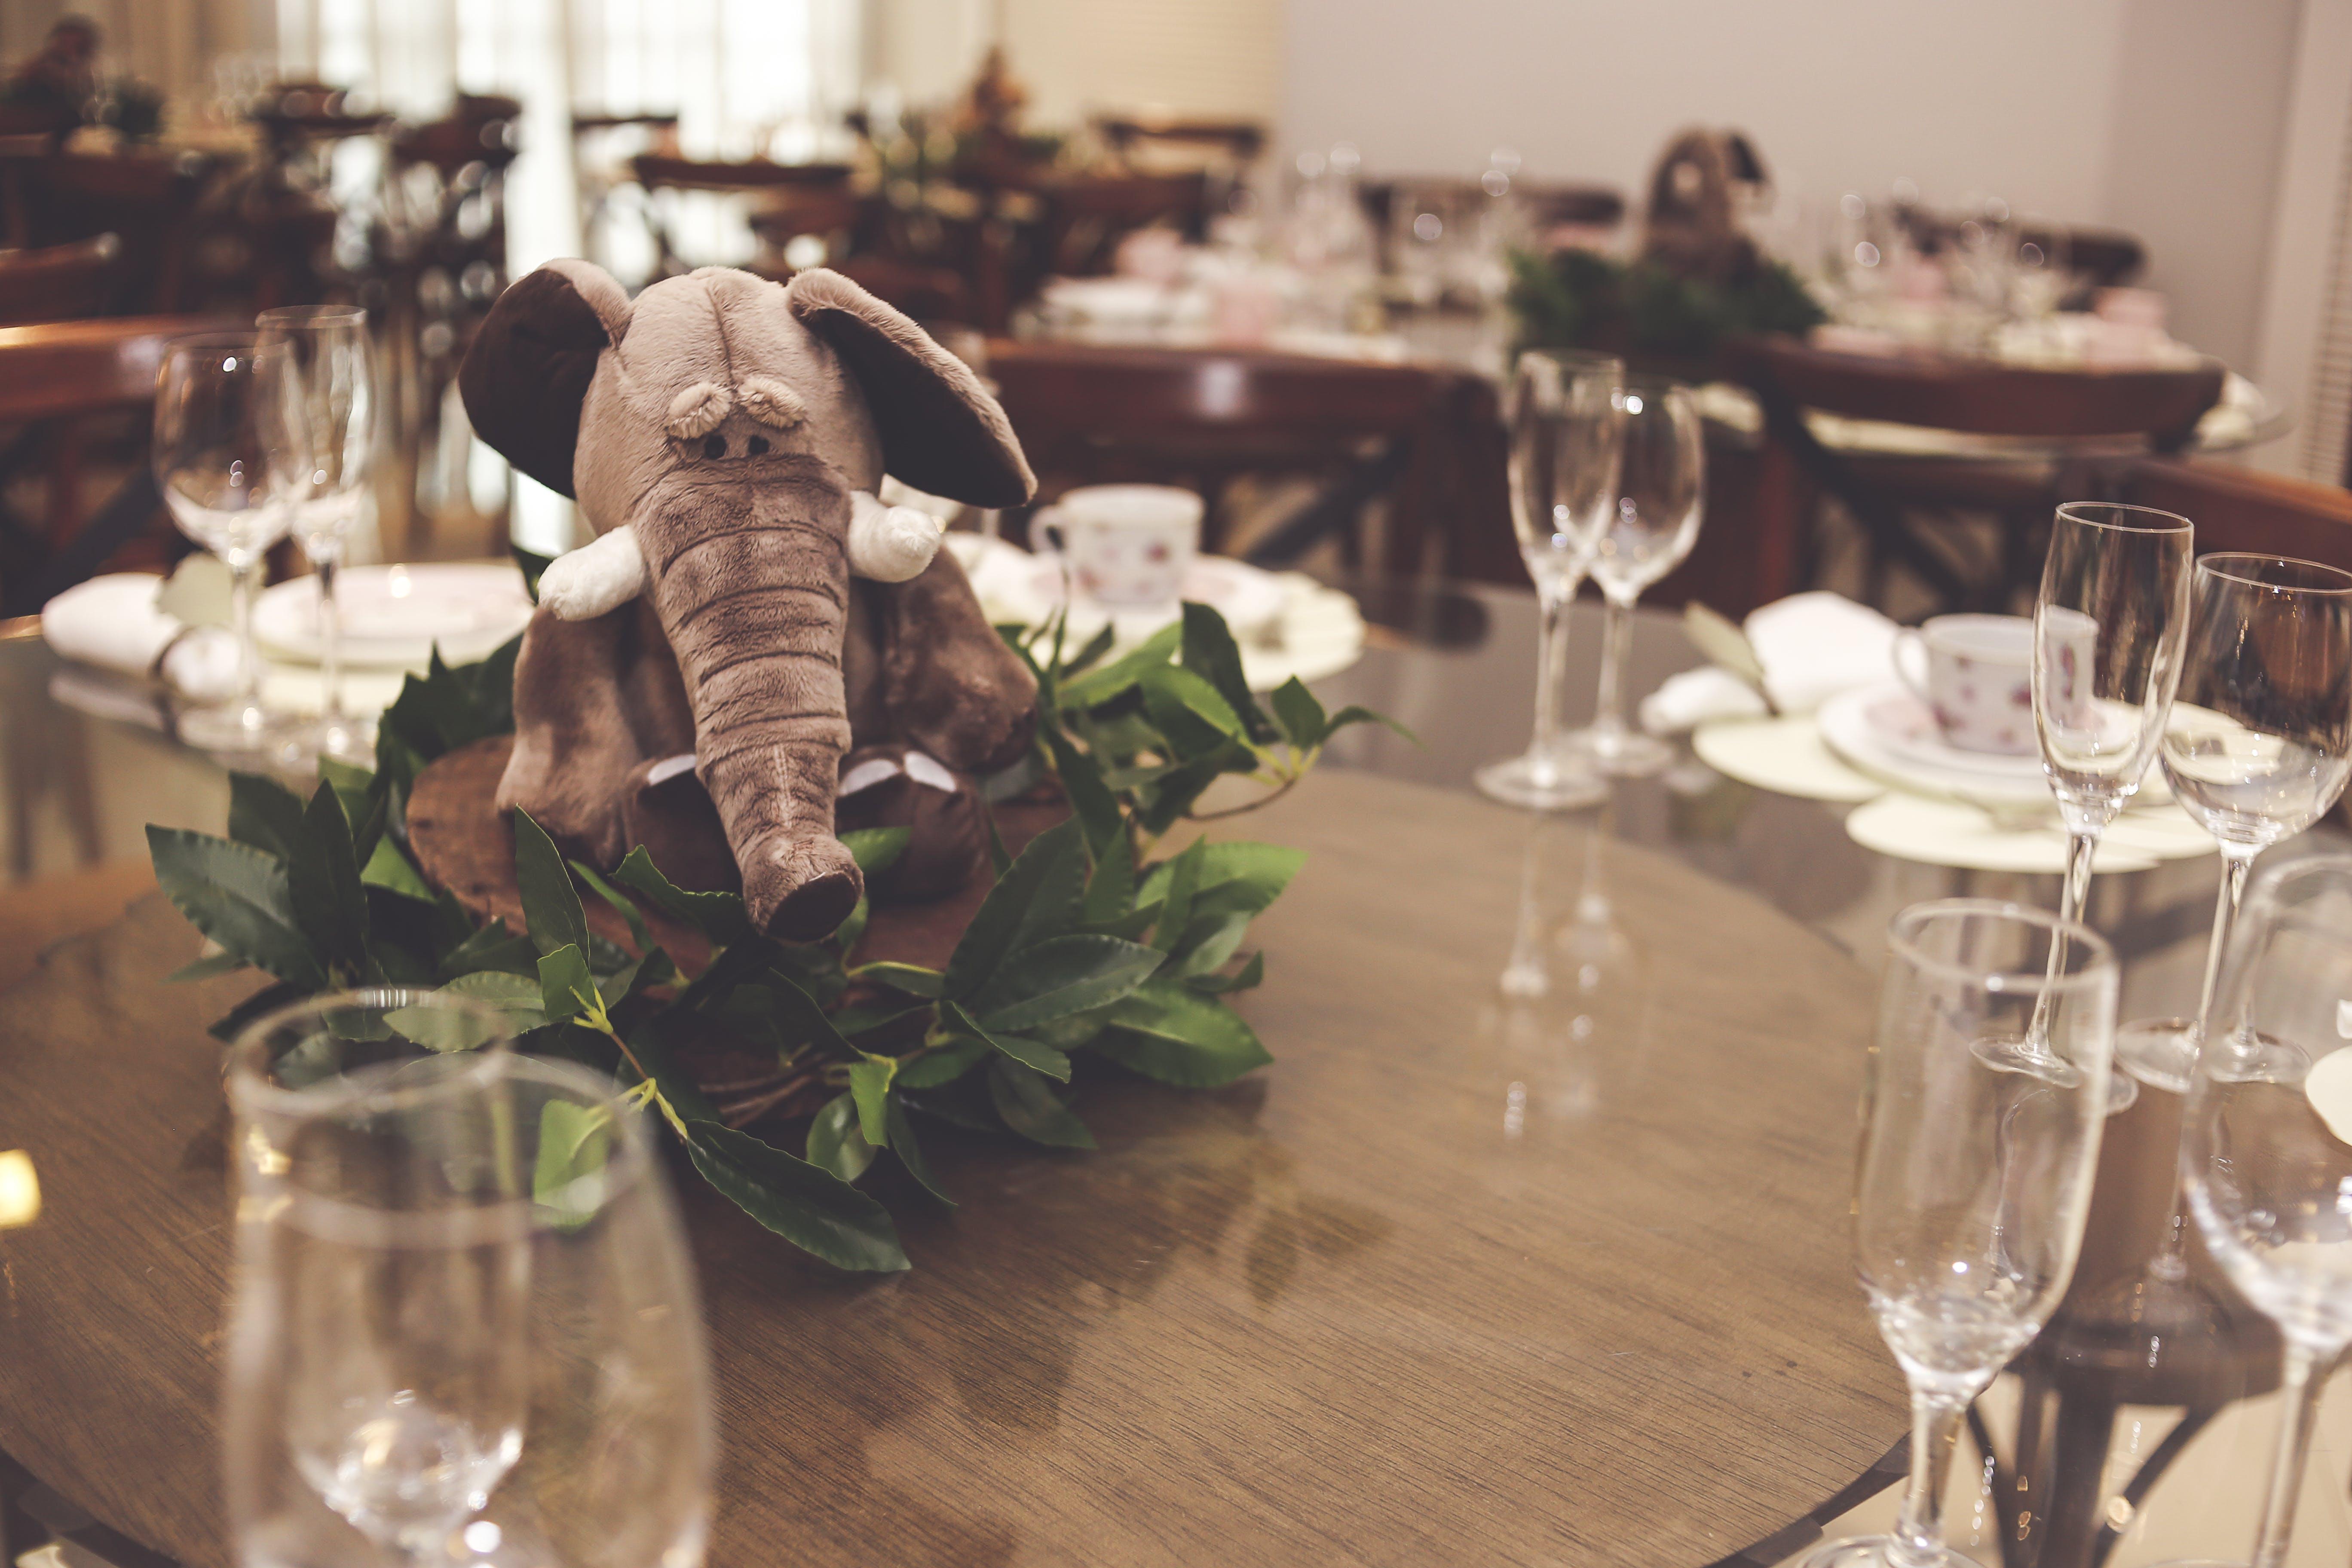 Grey Elephant Plush Toy Table Centerpiece